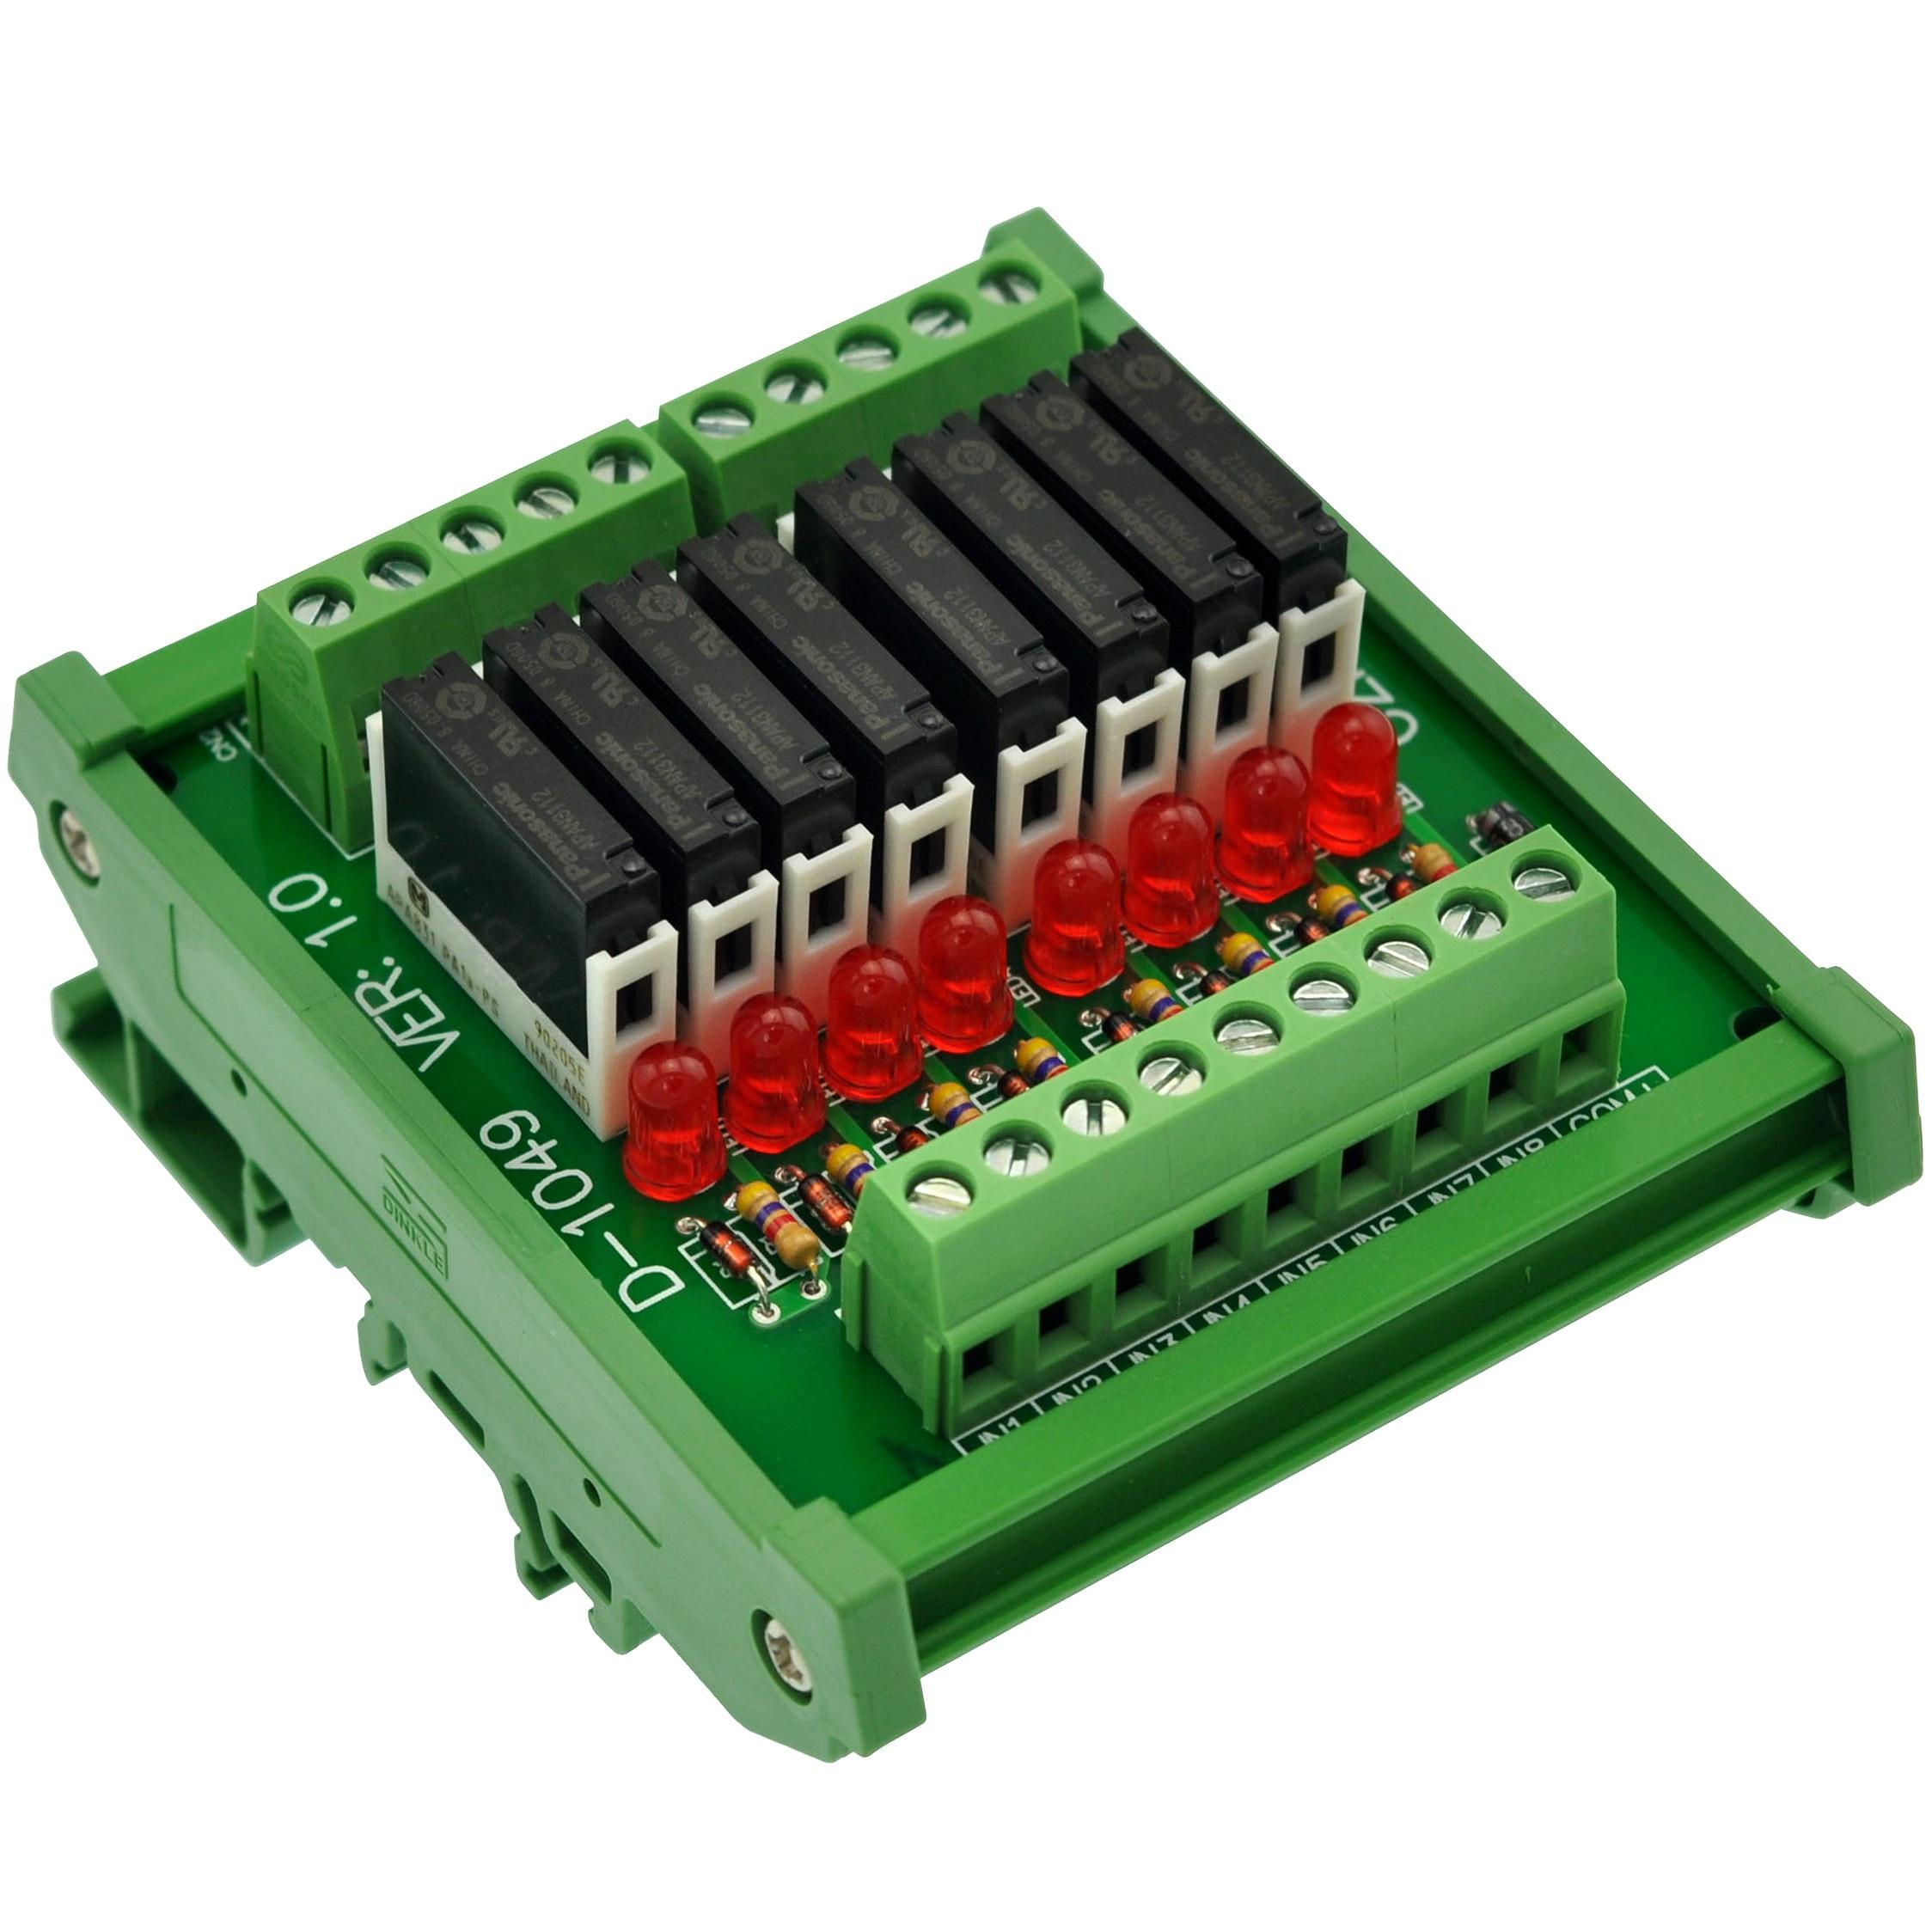 Slim DIN Rail Mount DC12V Sink/NPN 8 SPST NO 5A Power Relay Module, PA1a 12V